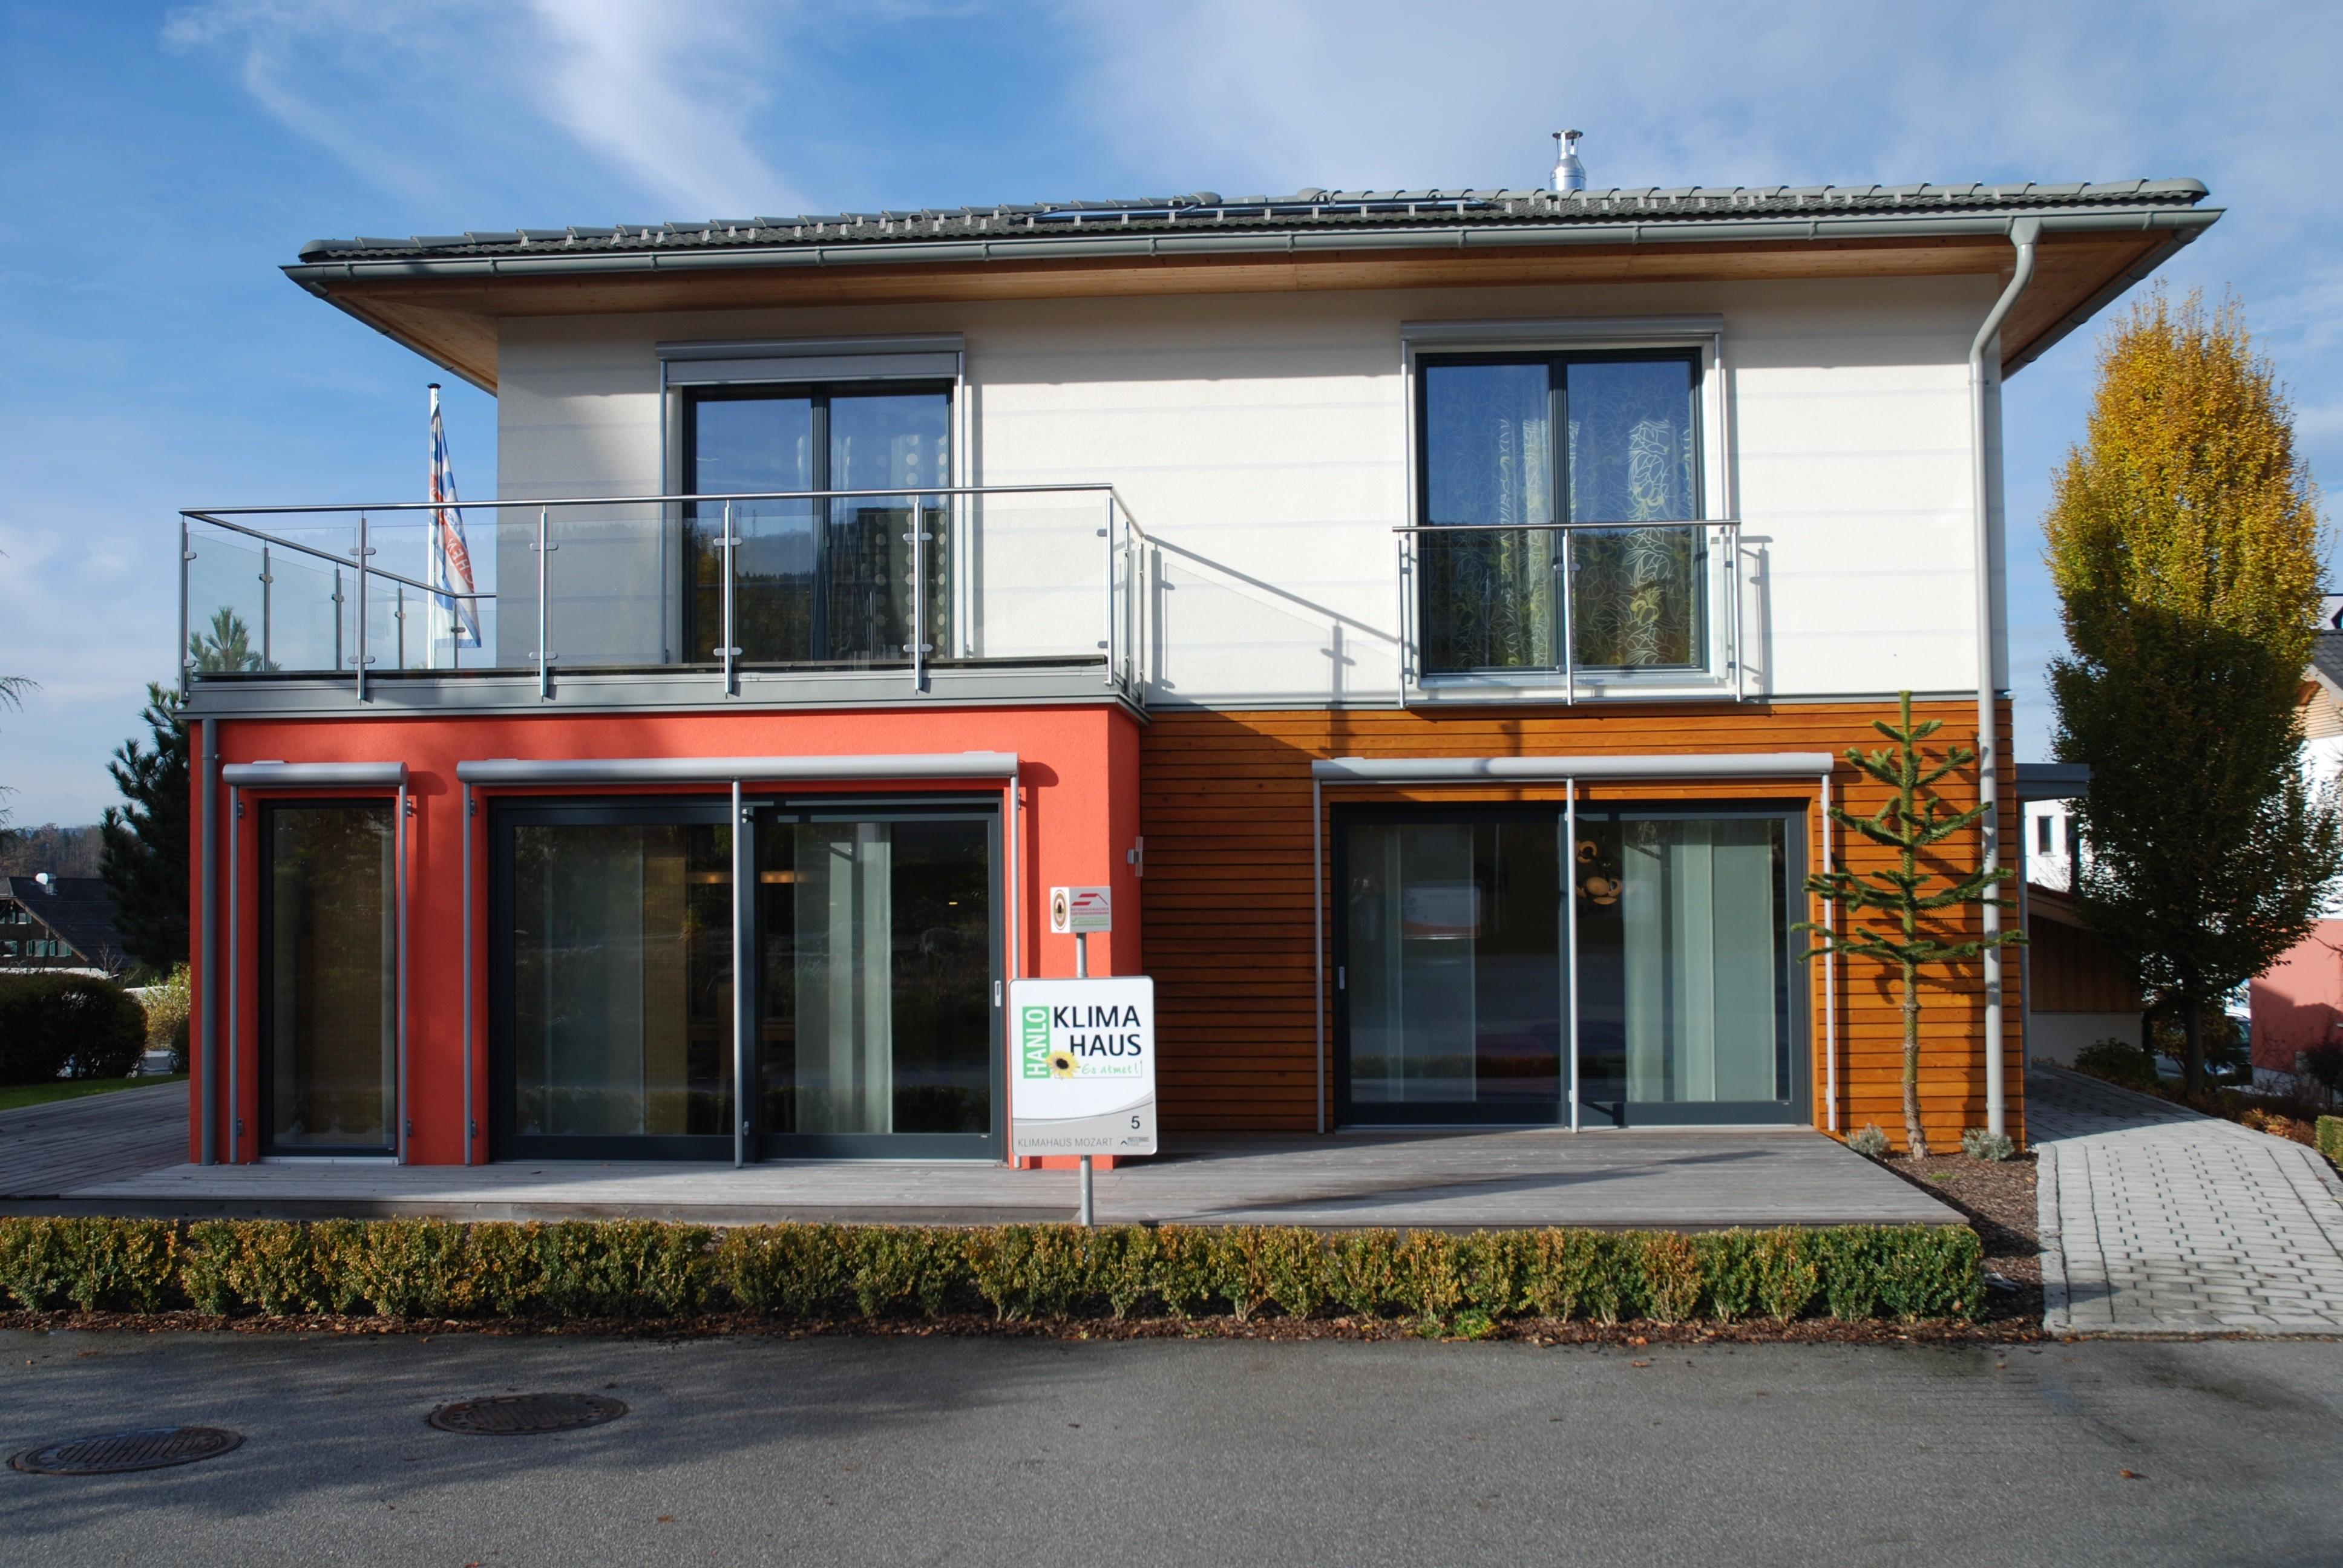 Beautiful Hanlo Haus Preise Pictures - Kosherelsalvador.com ...